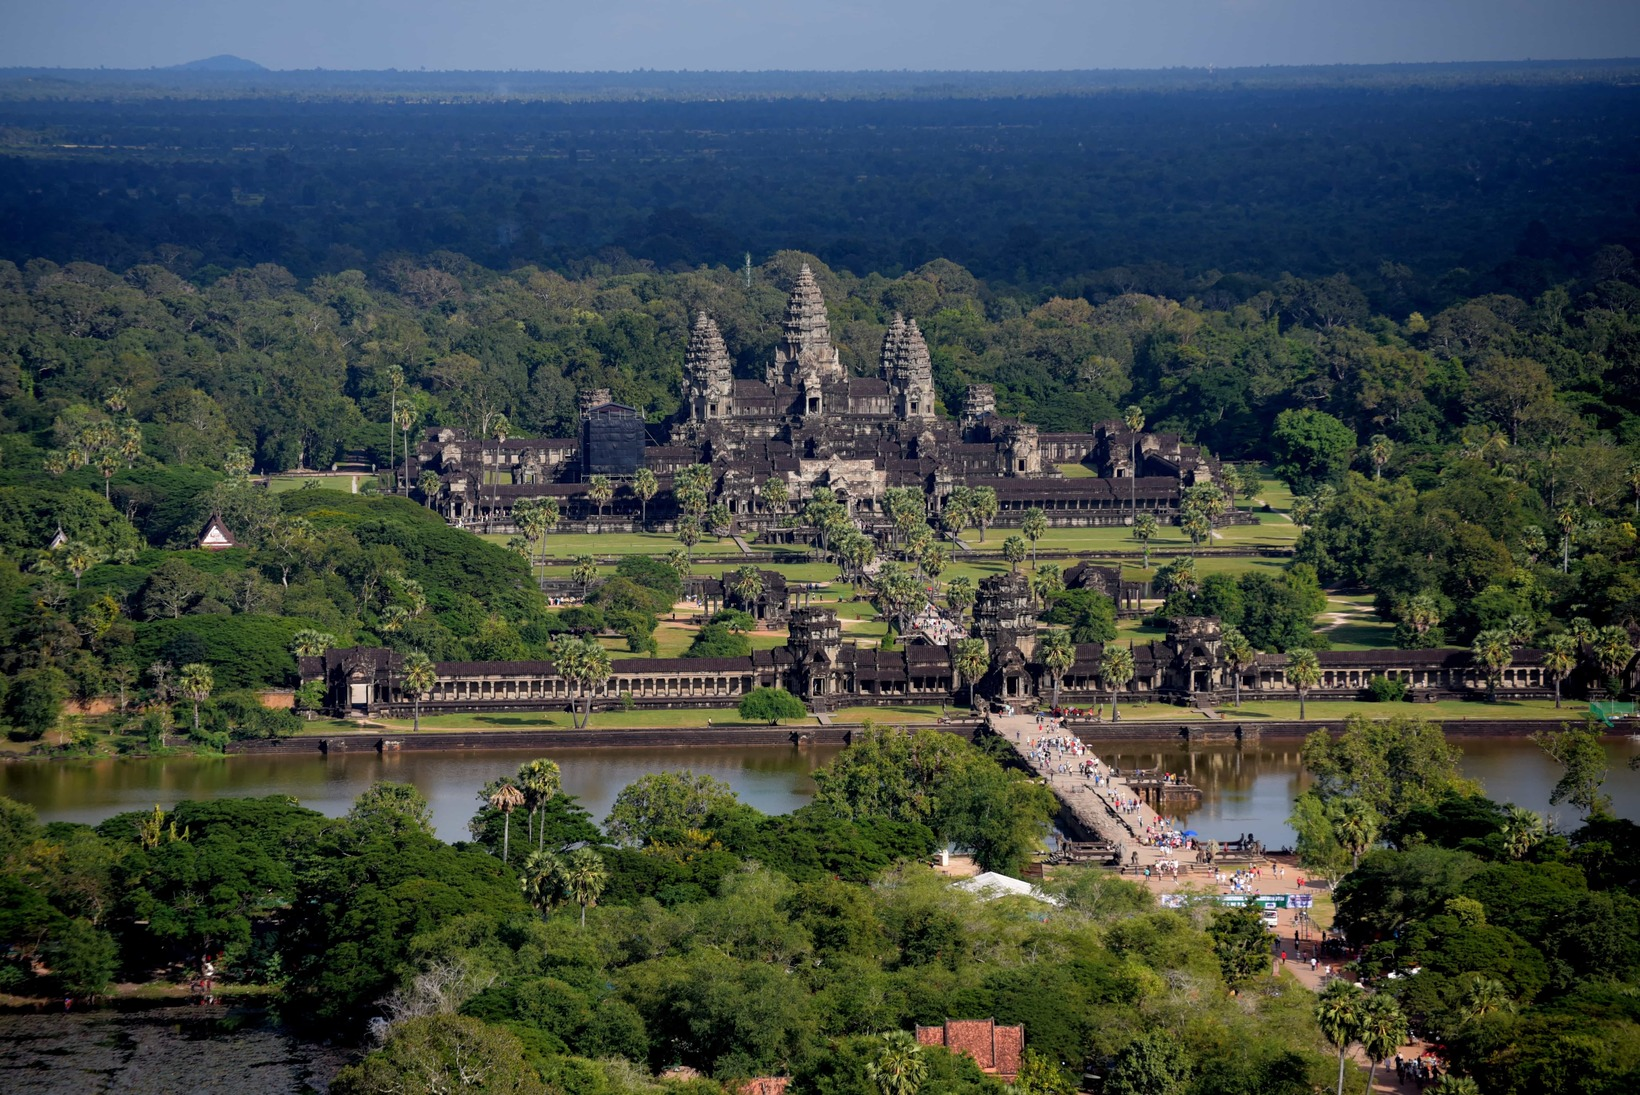 Best Way to Visit Angkor Wat